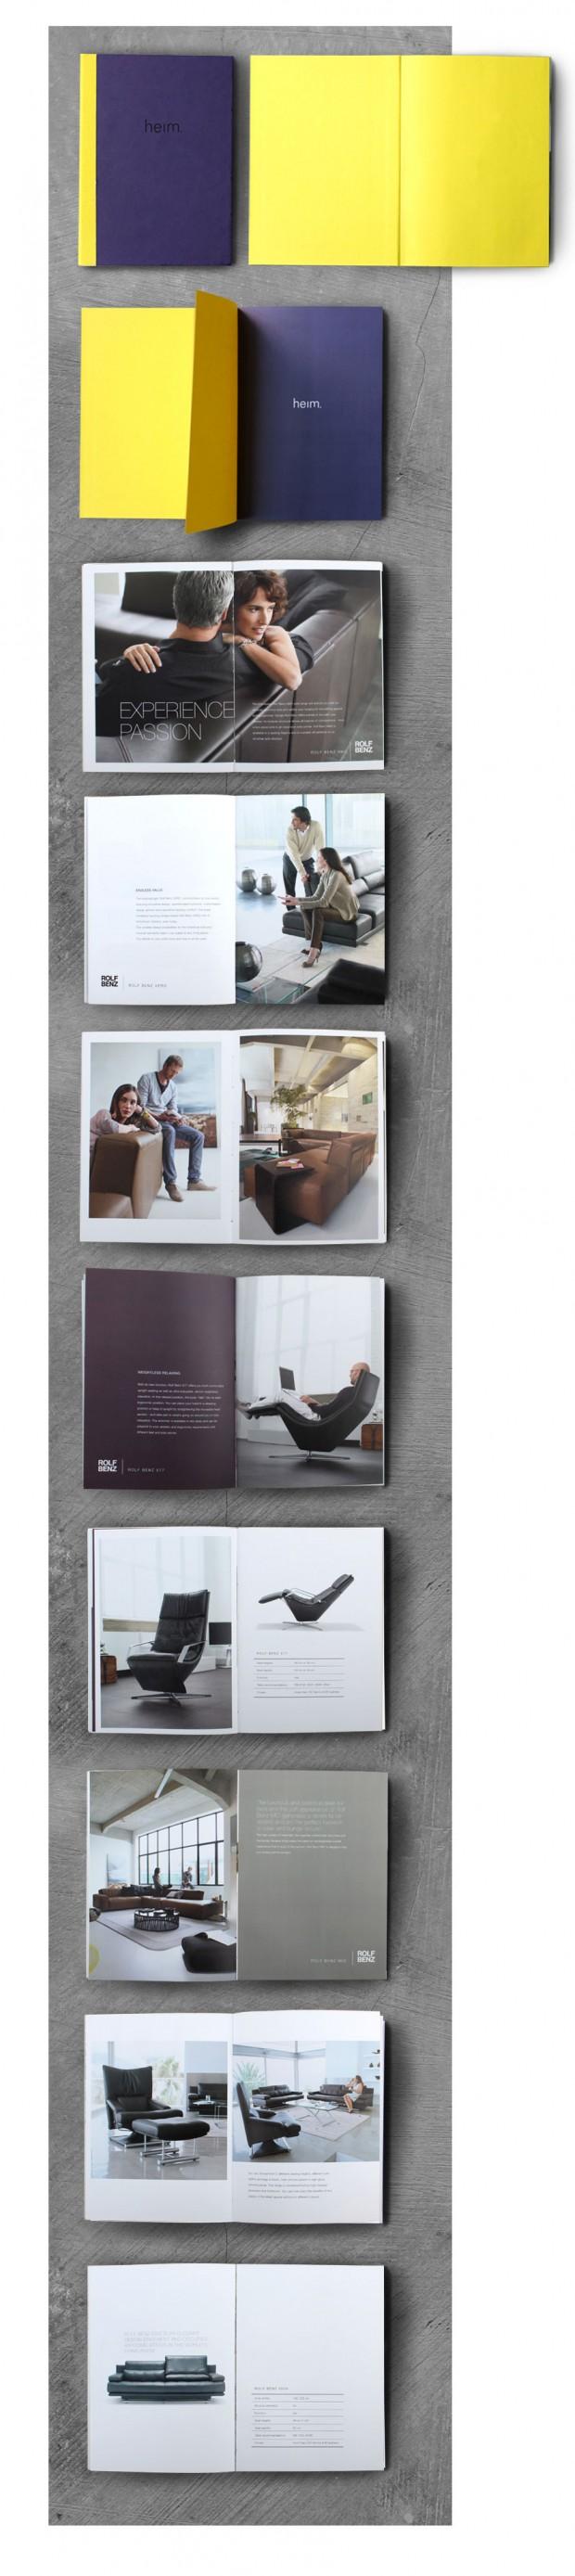 brand guidelines book design inspiration